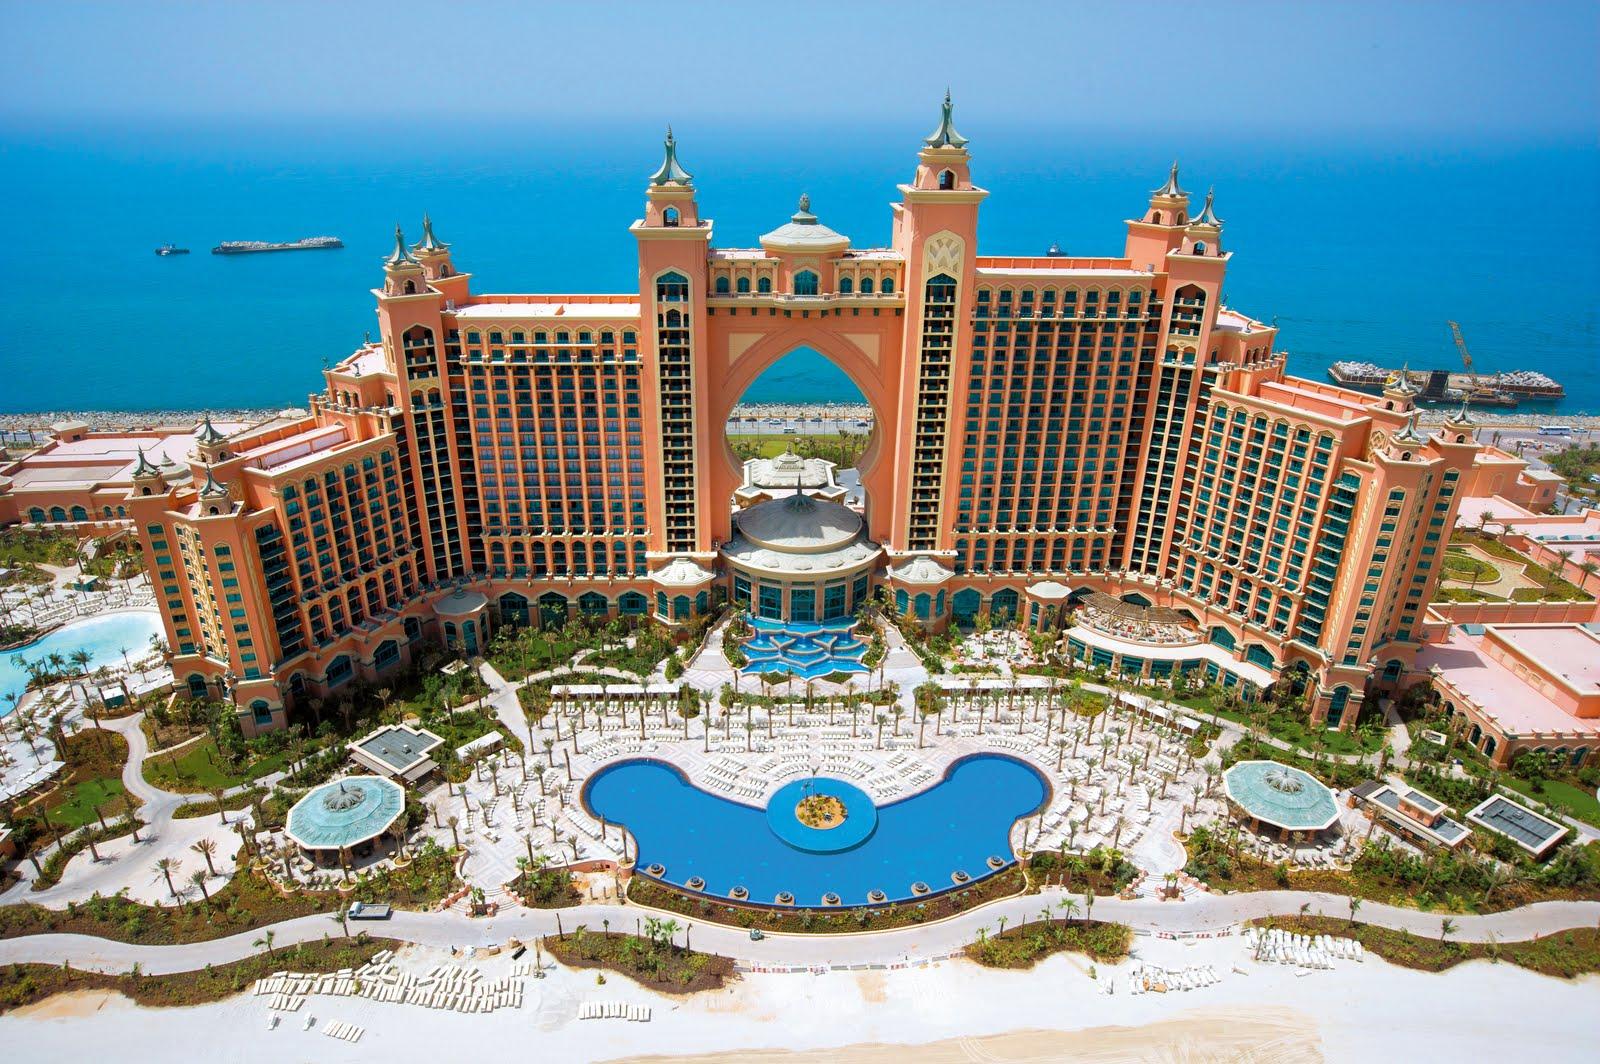 El maravilloso hotel Atlantis the Palm en la palmera de Duabi